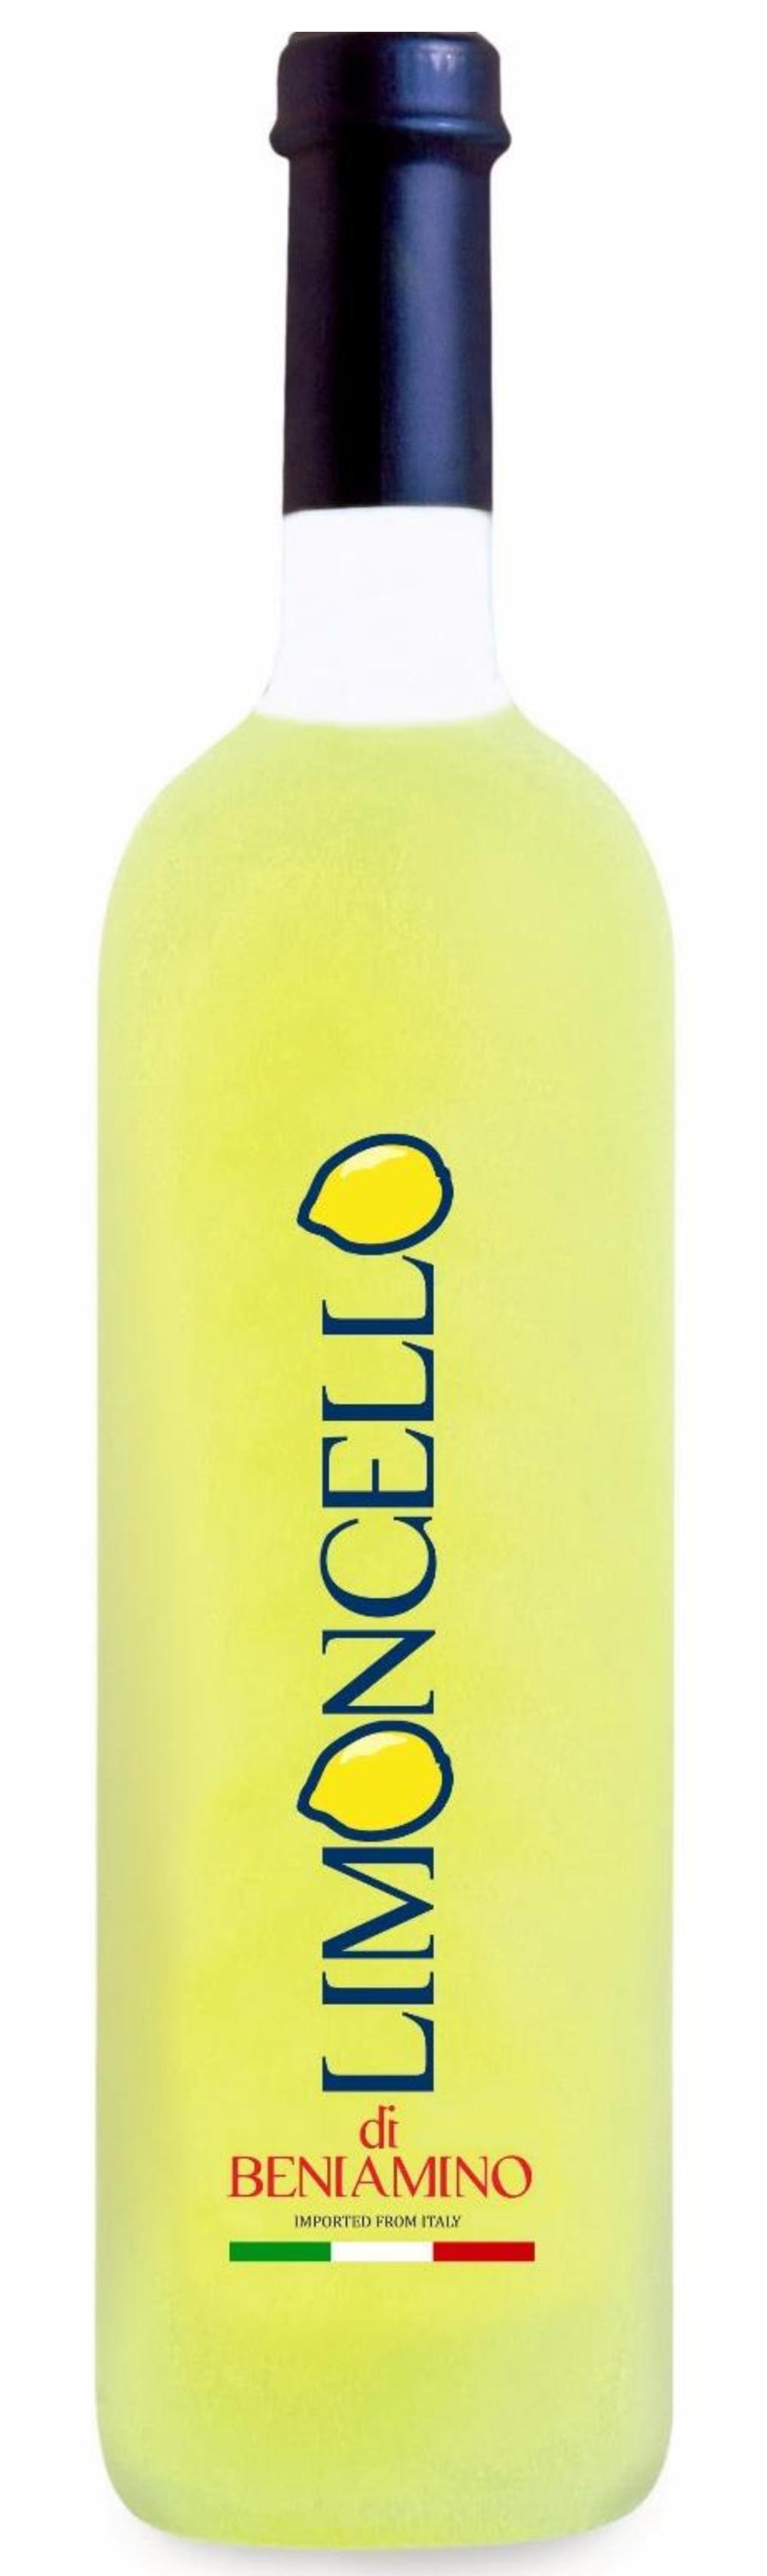 Liquore Limoncello 0,7 Liter